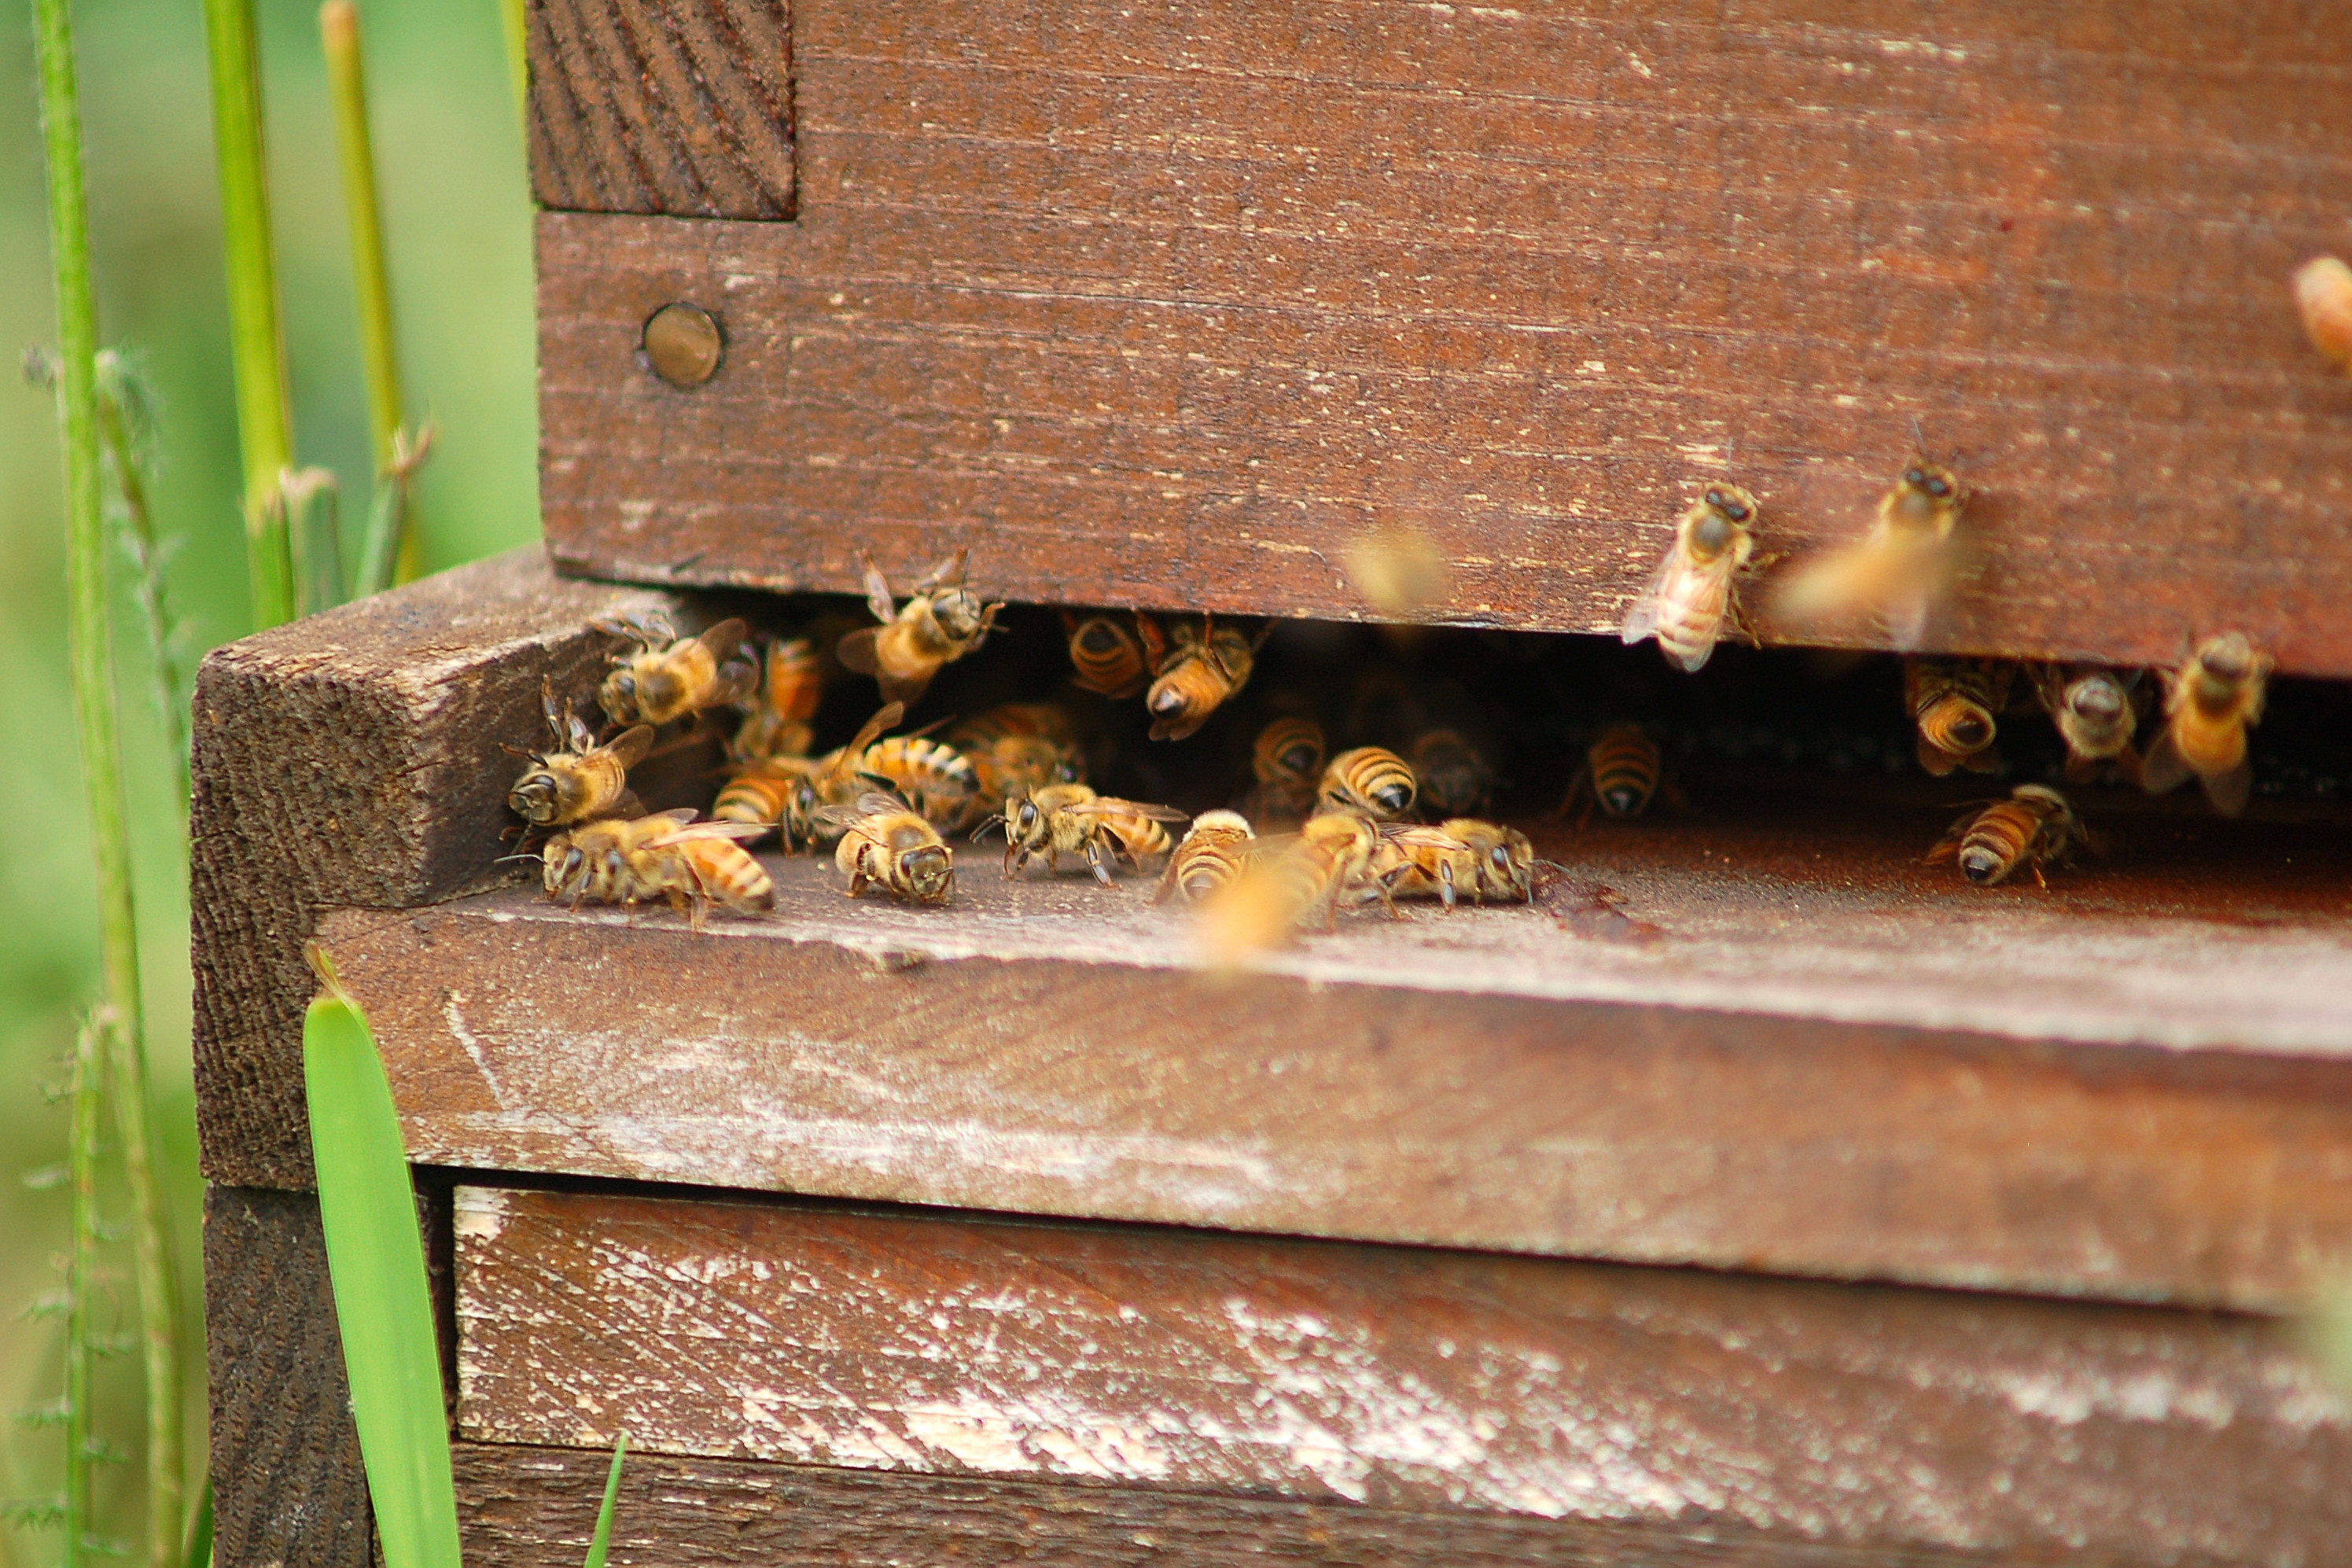 Bees gathering pollen